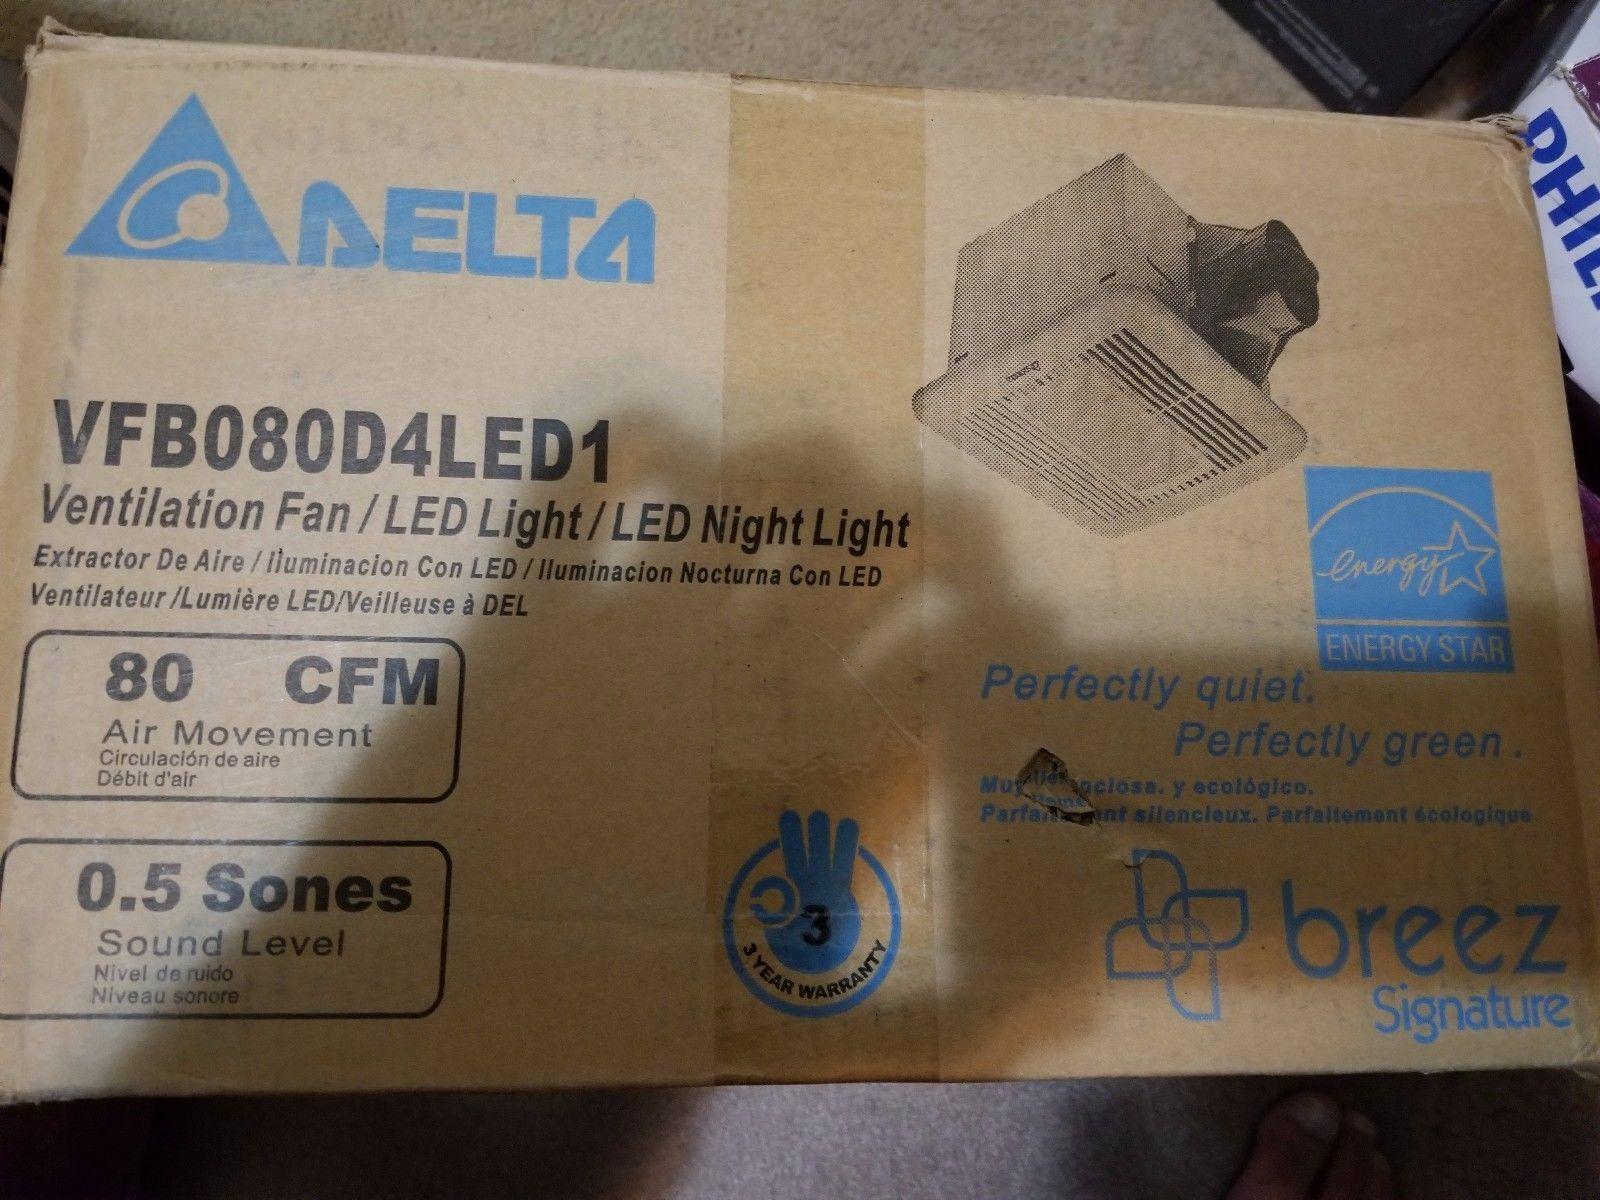 Delta Breez Bathroom Fans Sig80mled Breezsignature 80 Cfm: Breez Signature 80 CFM Energy Star Exhaust Bathroom Fan